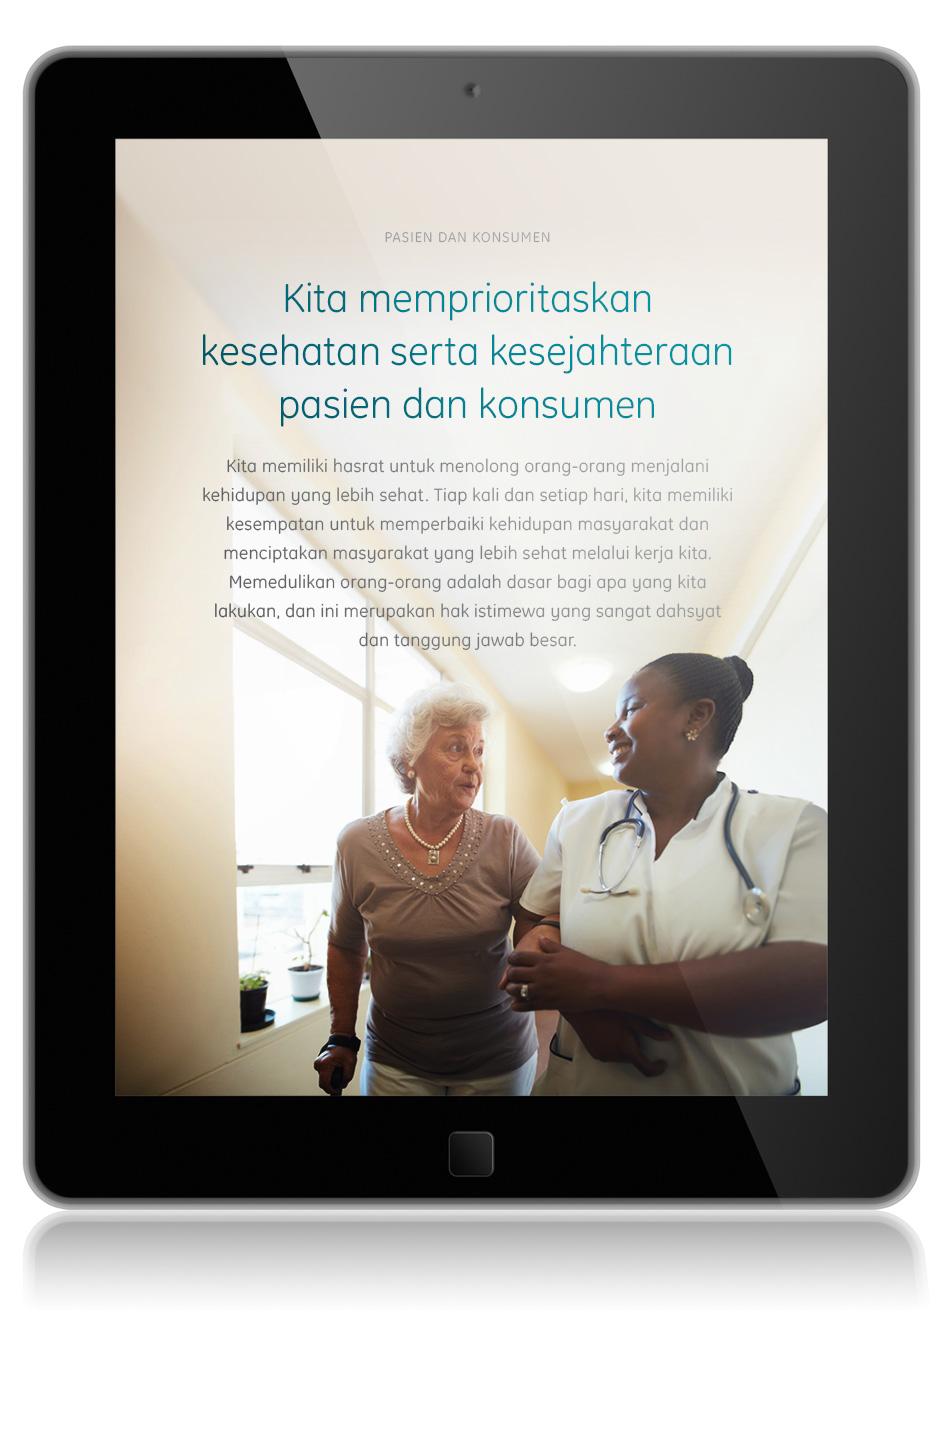 OurWork_Train75k_iPad_Indonesian.jpg